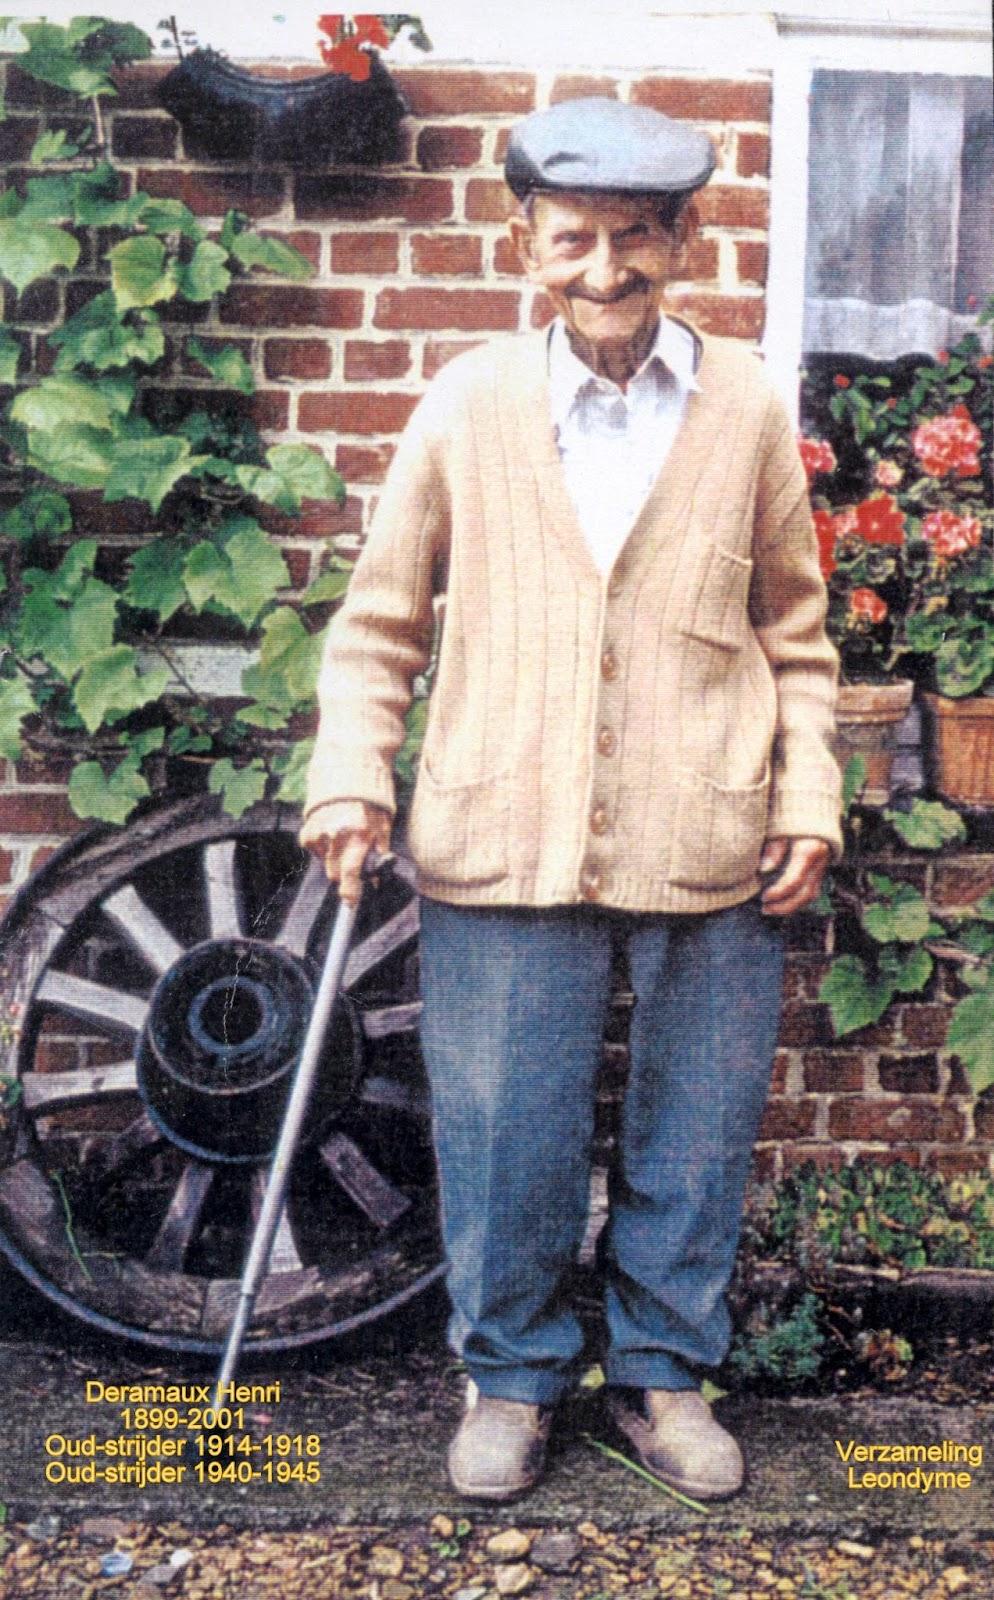 Oud-strijder Henri Deramaux 1899-2001. Verzameling Leondyme.